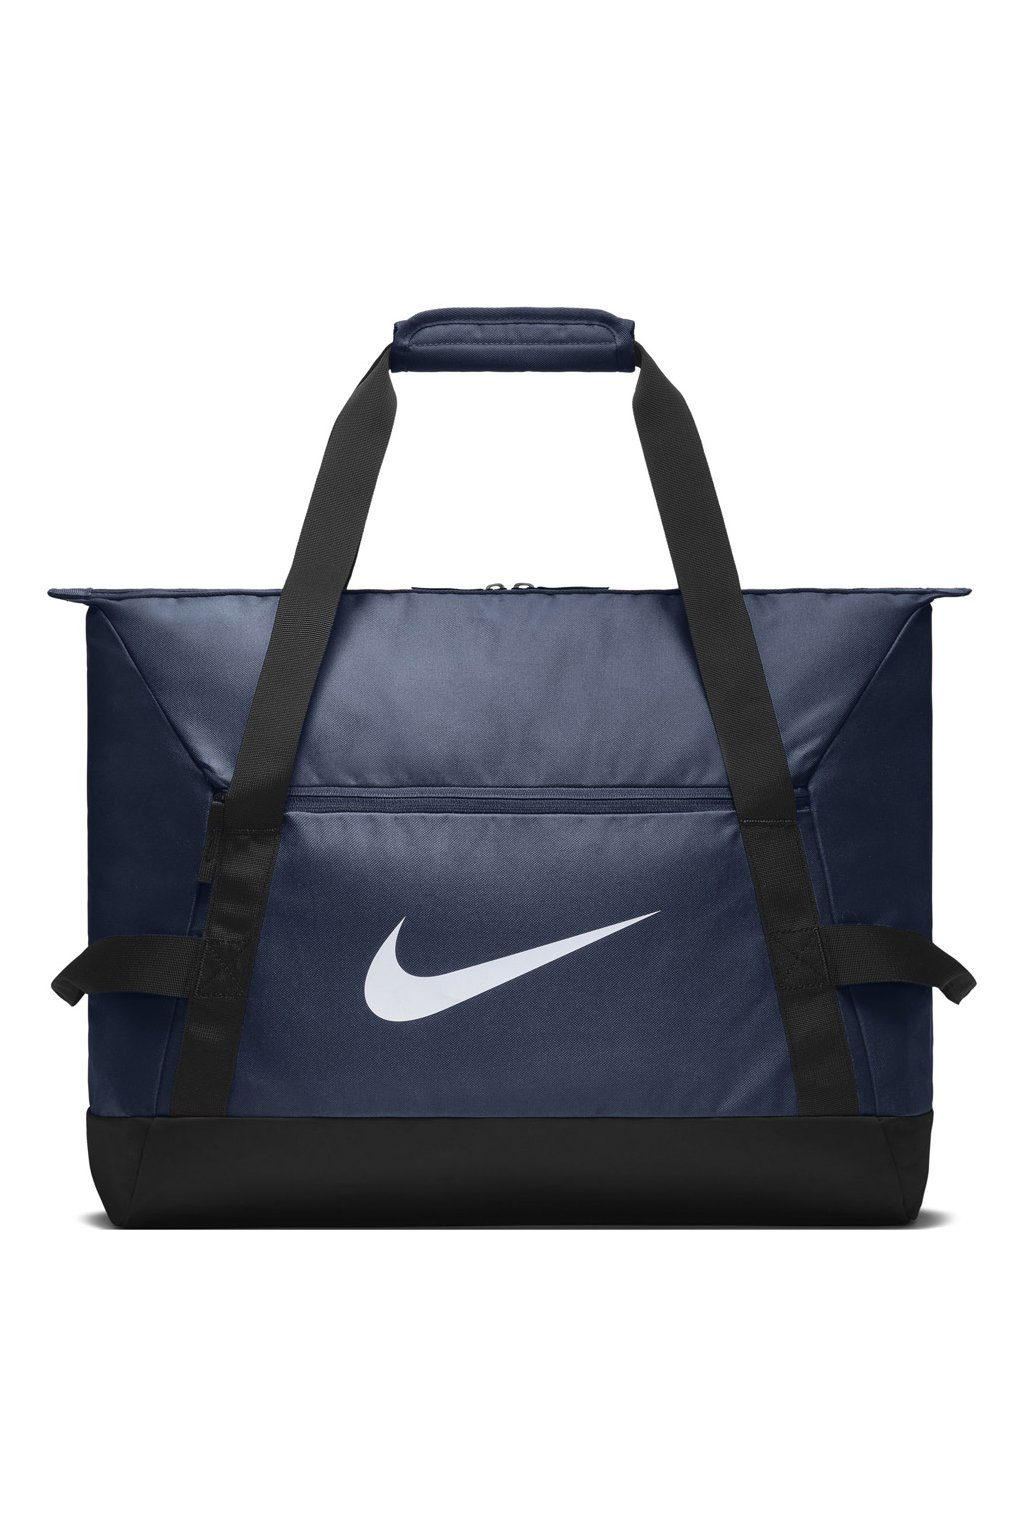 Taška Nike Academy Team M Duffel tmavo modrá BA5504 410